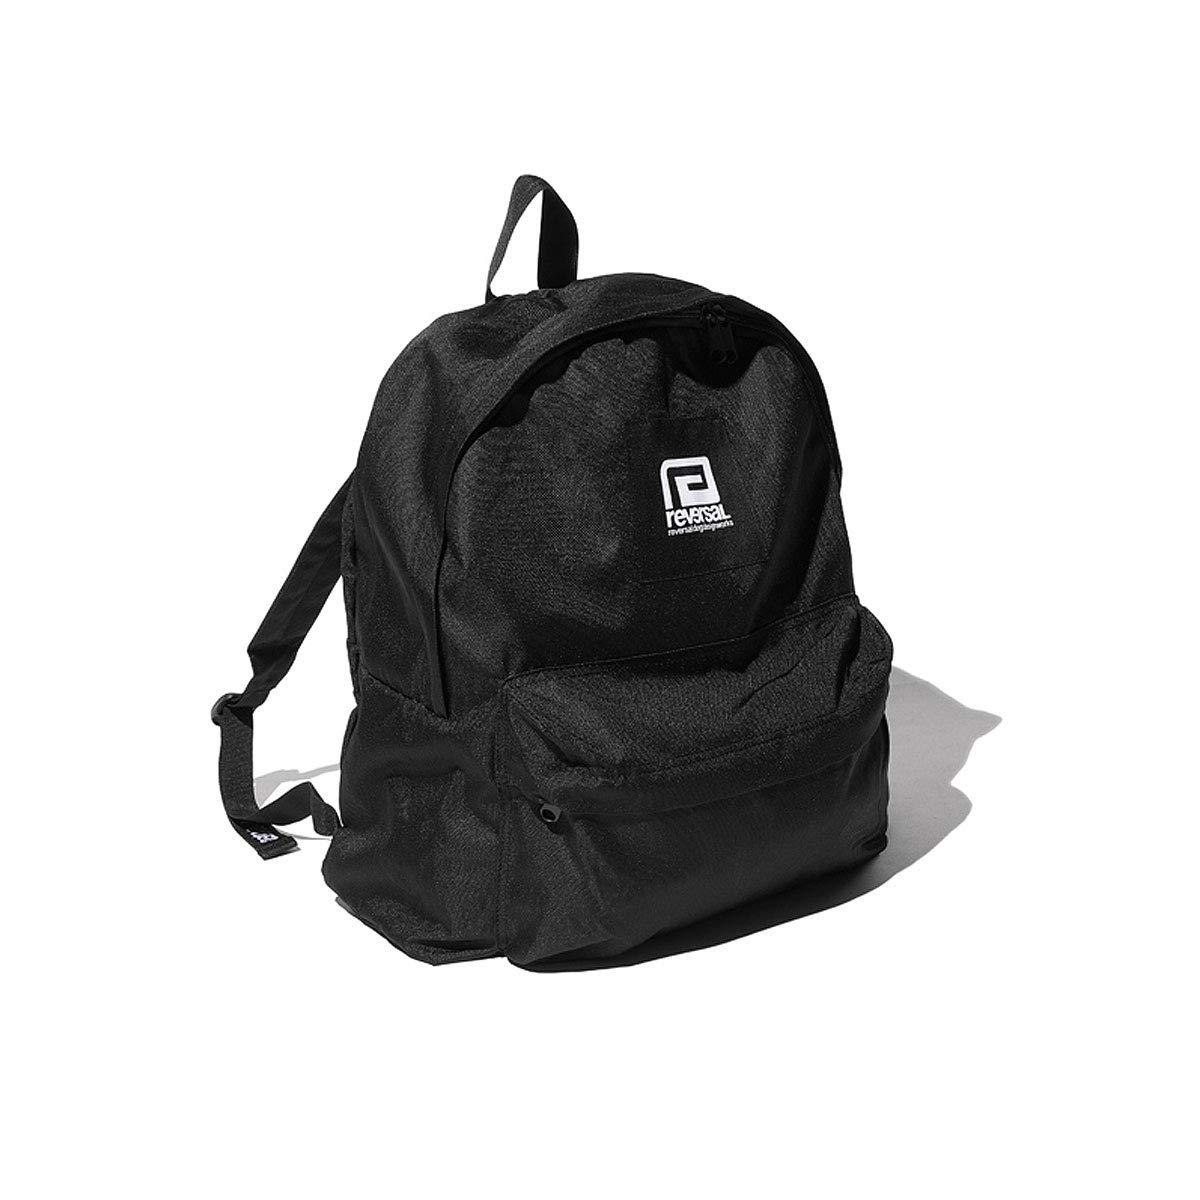 [REVERSAL (リバーサル)] バックパック BOX LOGO BACK PACK ボックスロゴ デザイン メンズ レディース [RV19SS046]  ブラック B07P437NKG